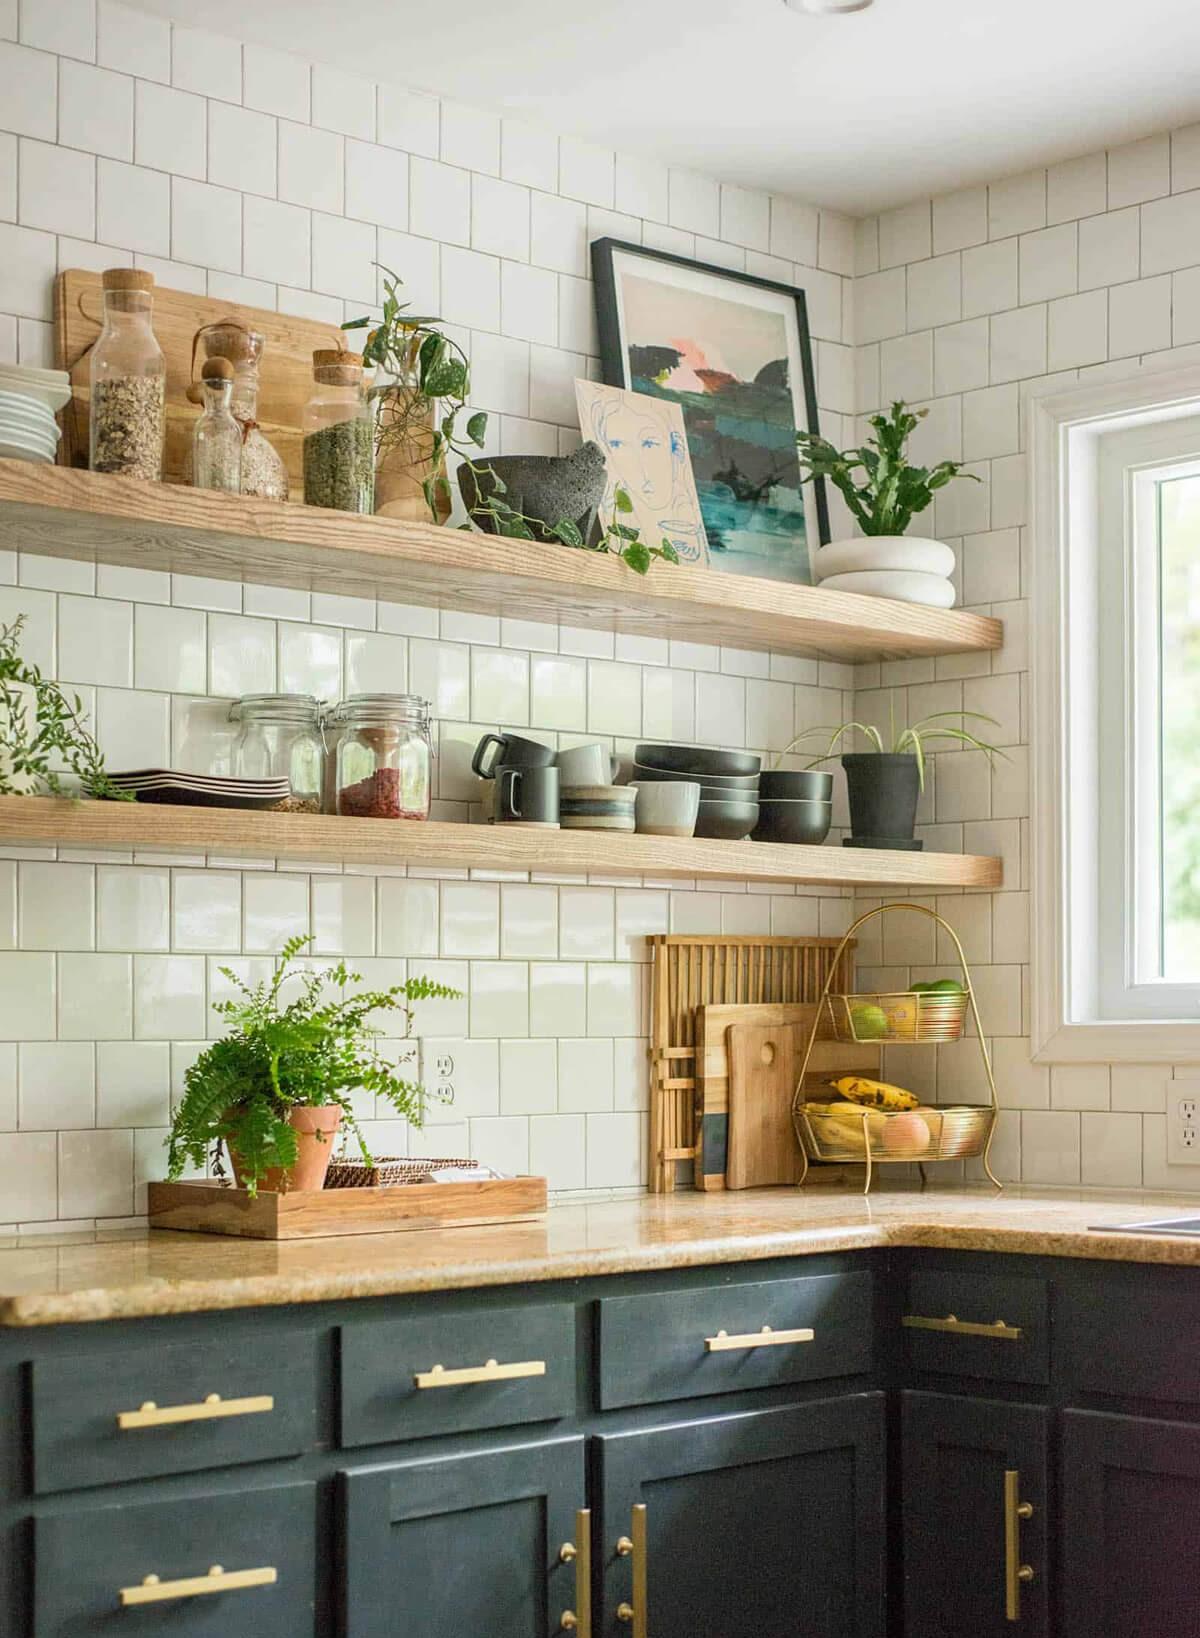 01-open-kitchen-shelf-ideas-homebnc